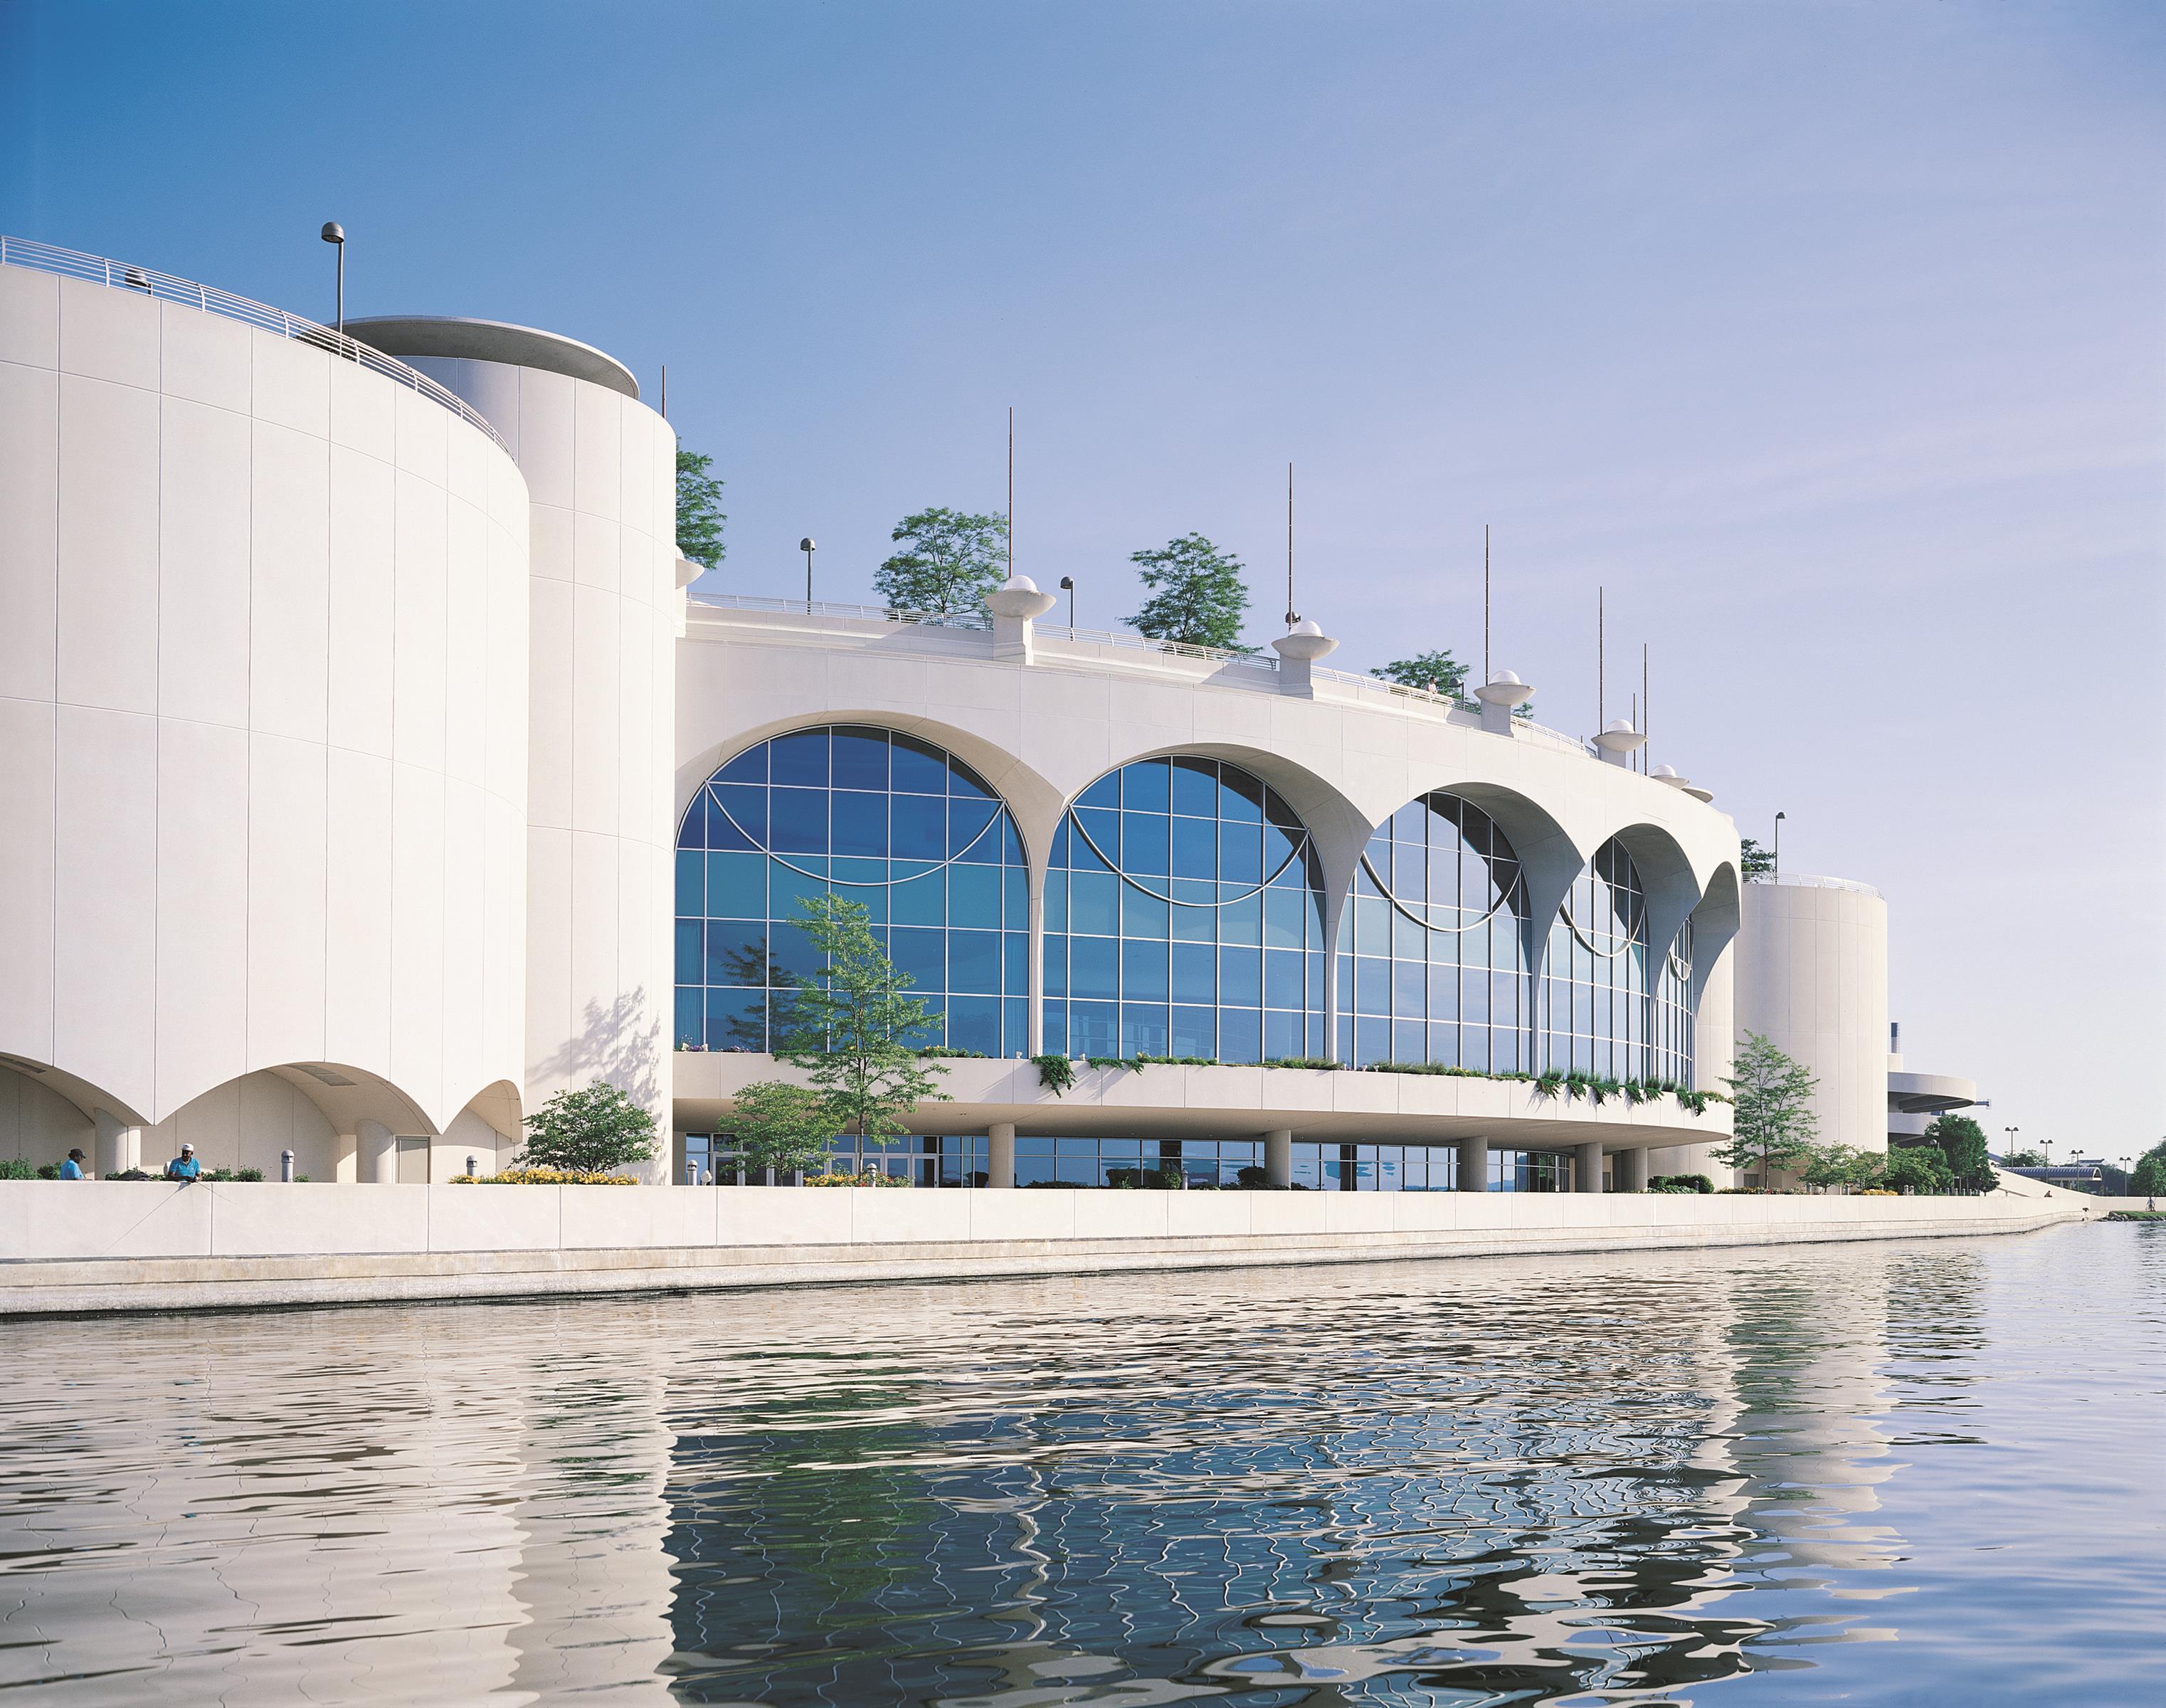 Frank Lloyd Wrights Monona Terrace >> Frank Lloyd Wright Designed Monona Terrace Convention Center Awarded